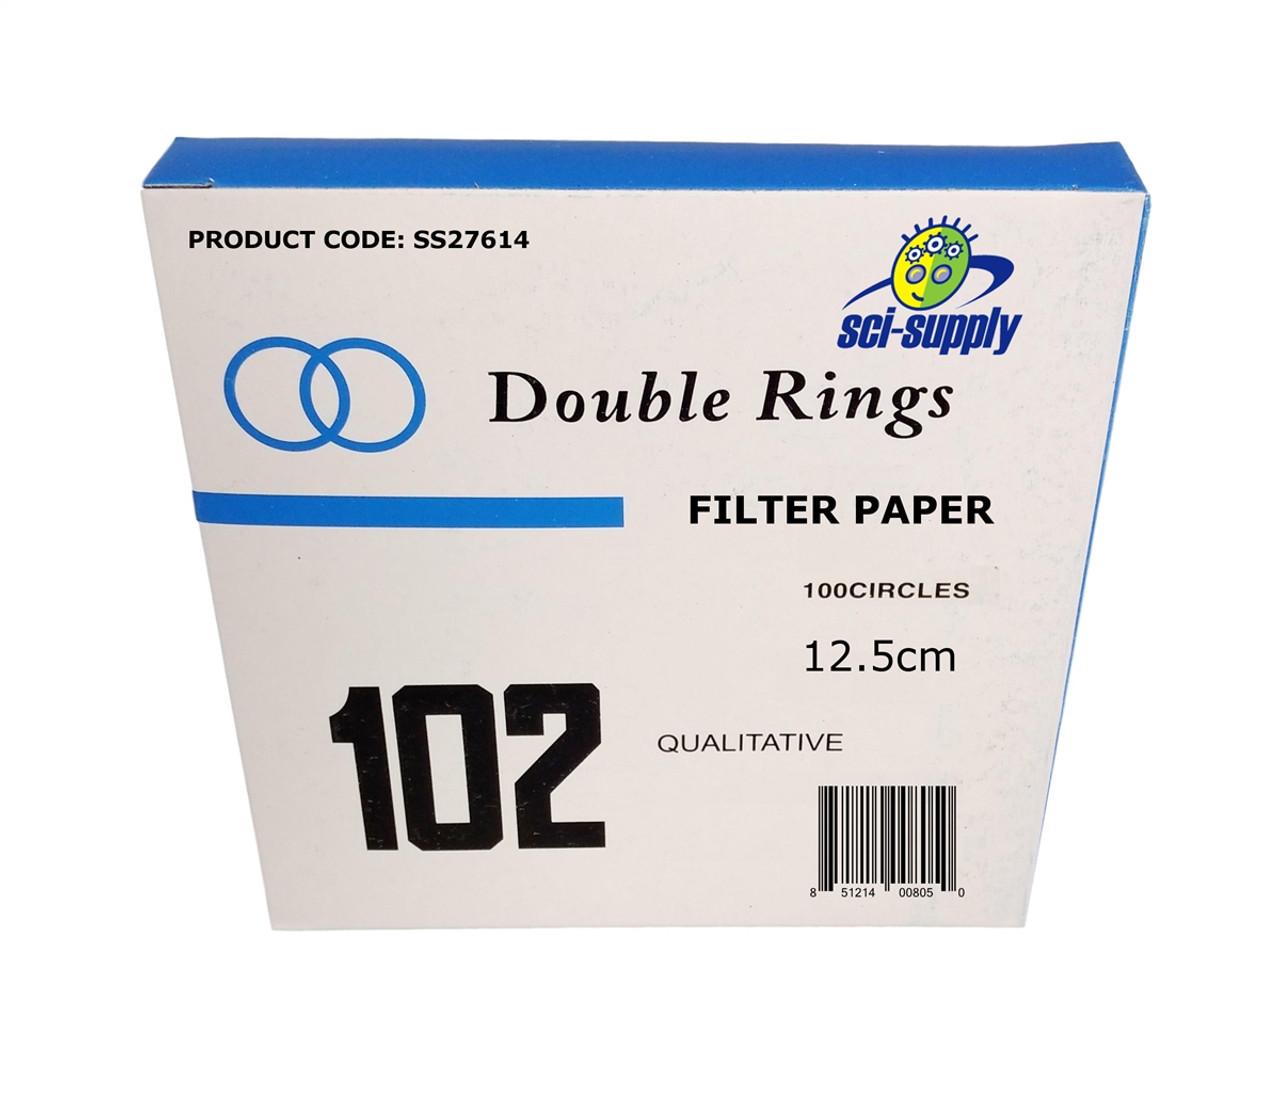 102 Qualitative Filter Paper 12.5 cm